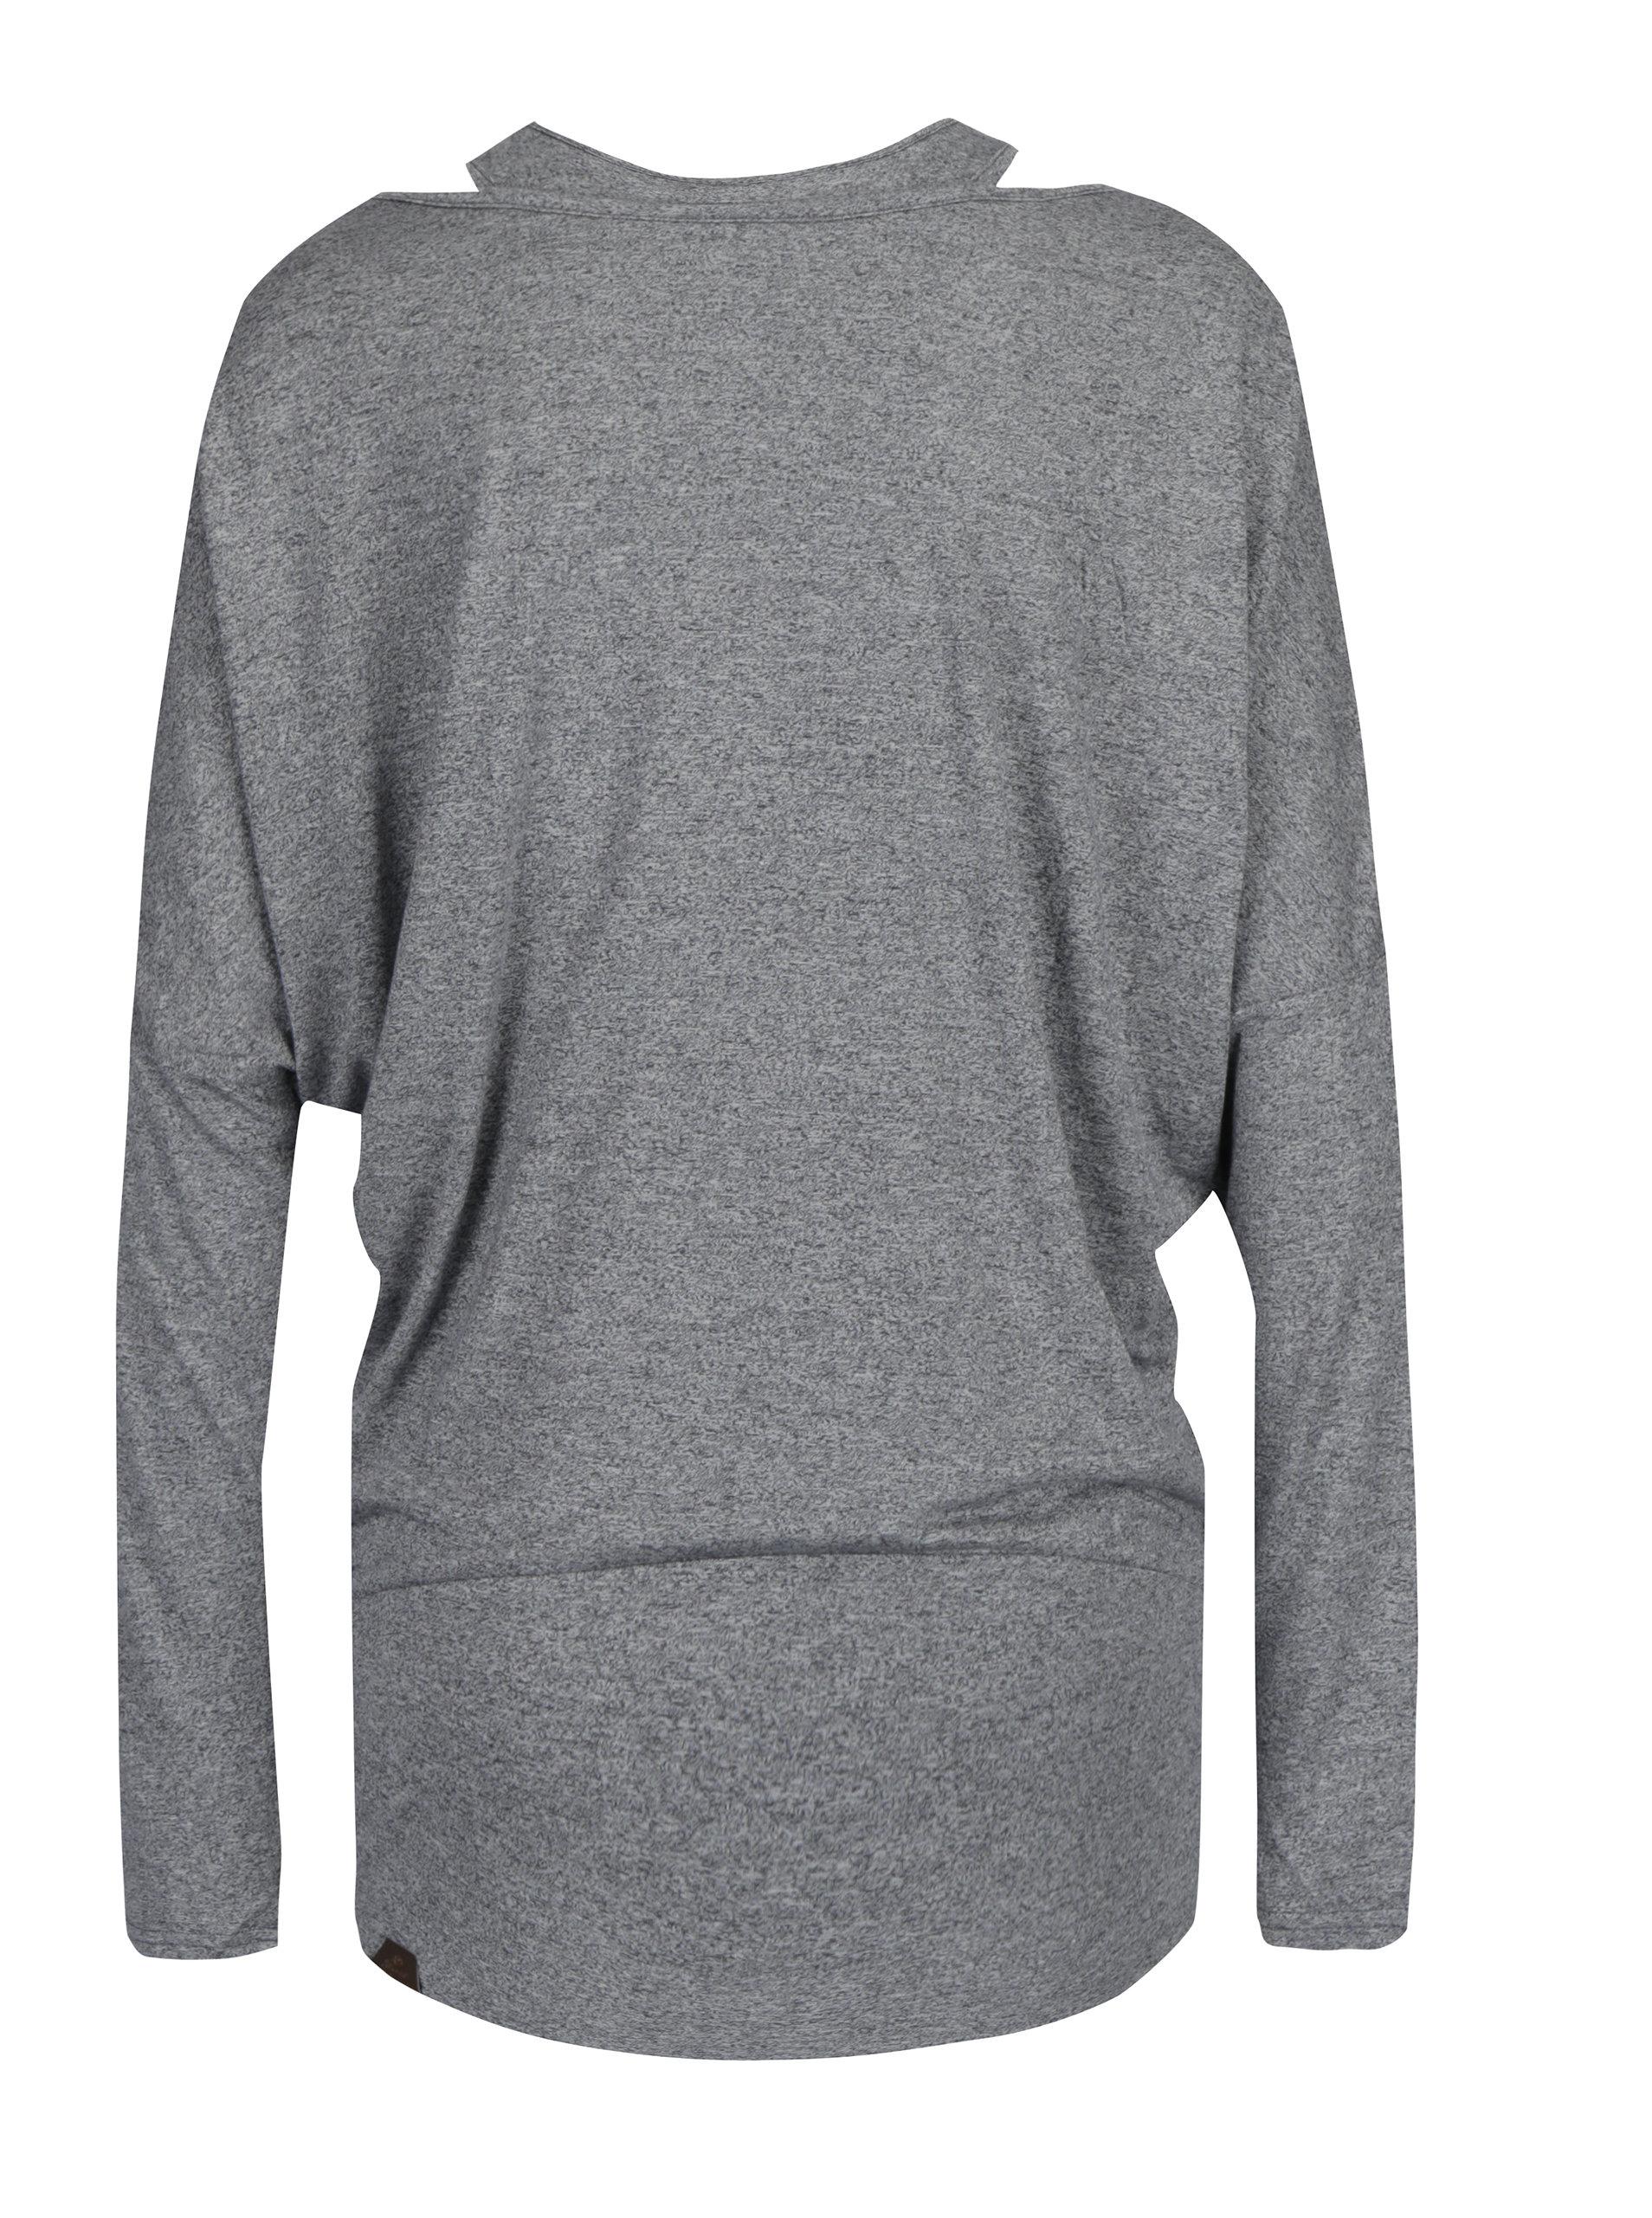 Šedé dámské volné dlouhé žíhané tričko s všitým tílkem Ragwear Sheila ... 7060db9a8d